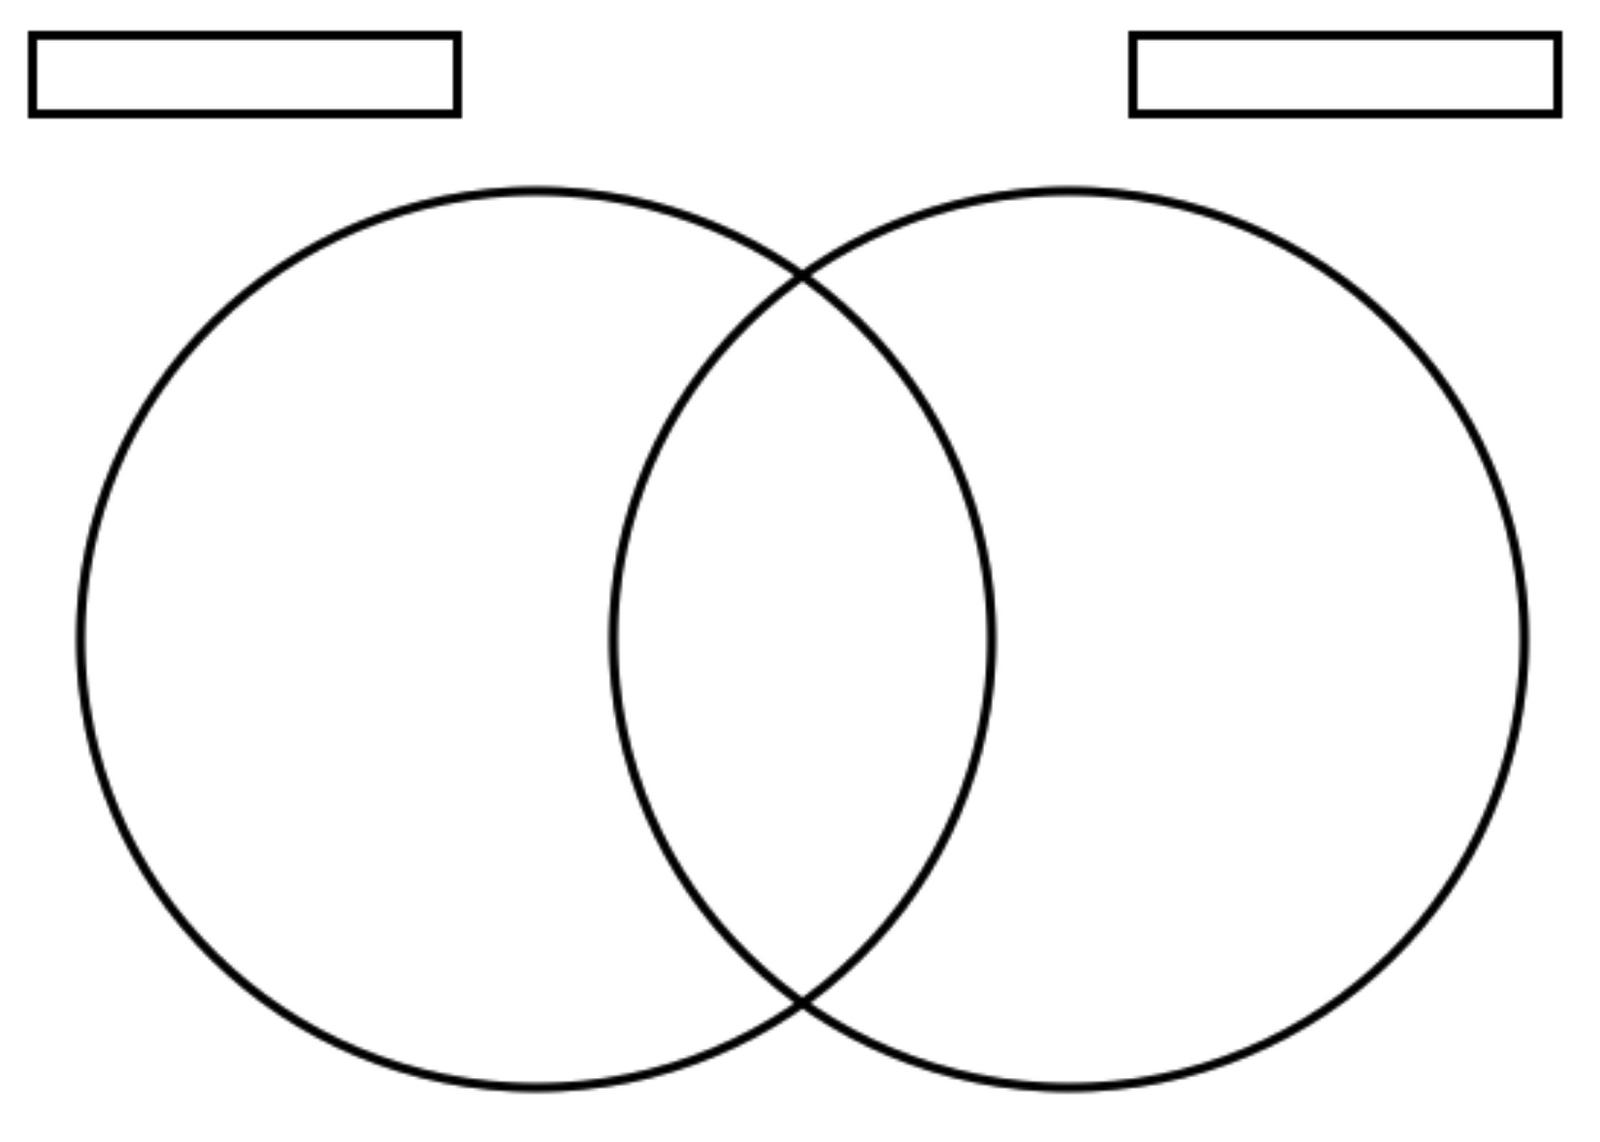 venn diagram template 5